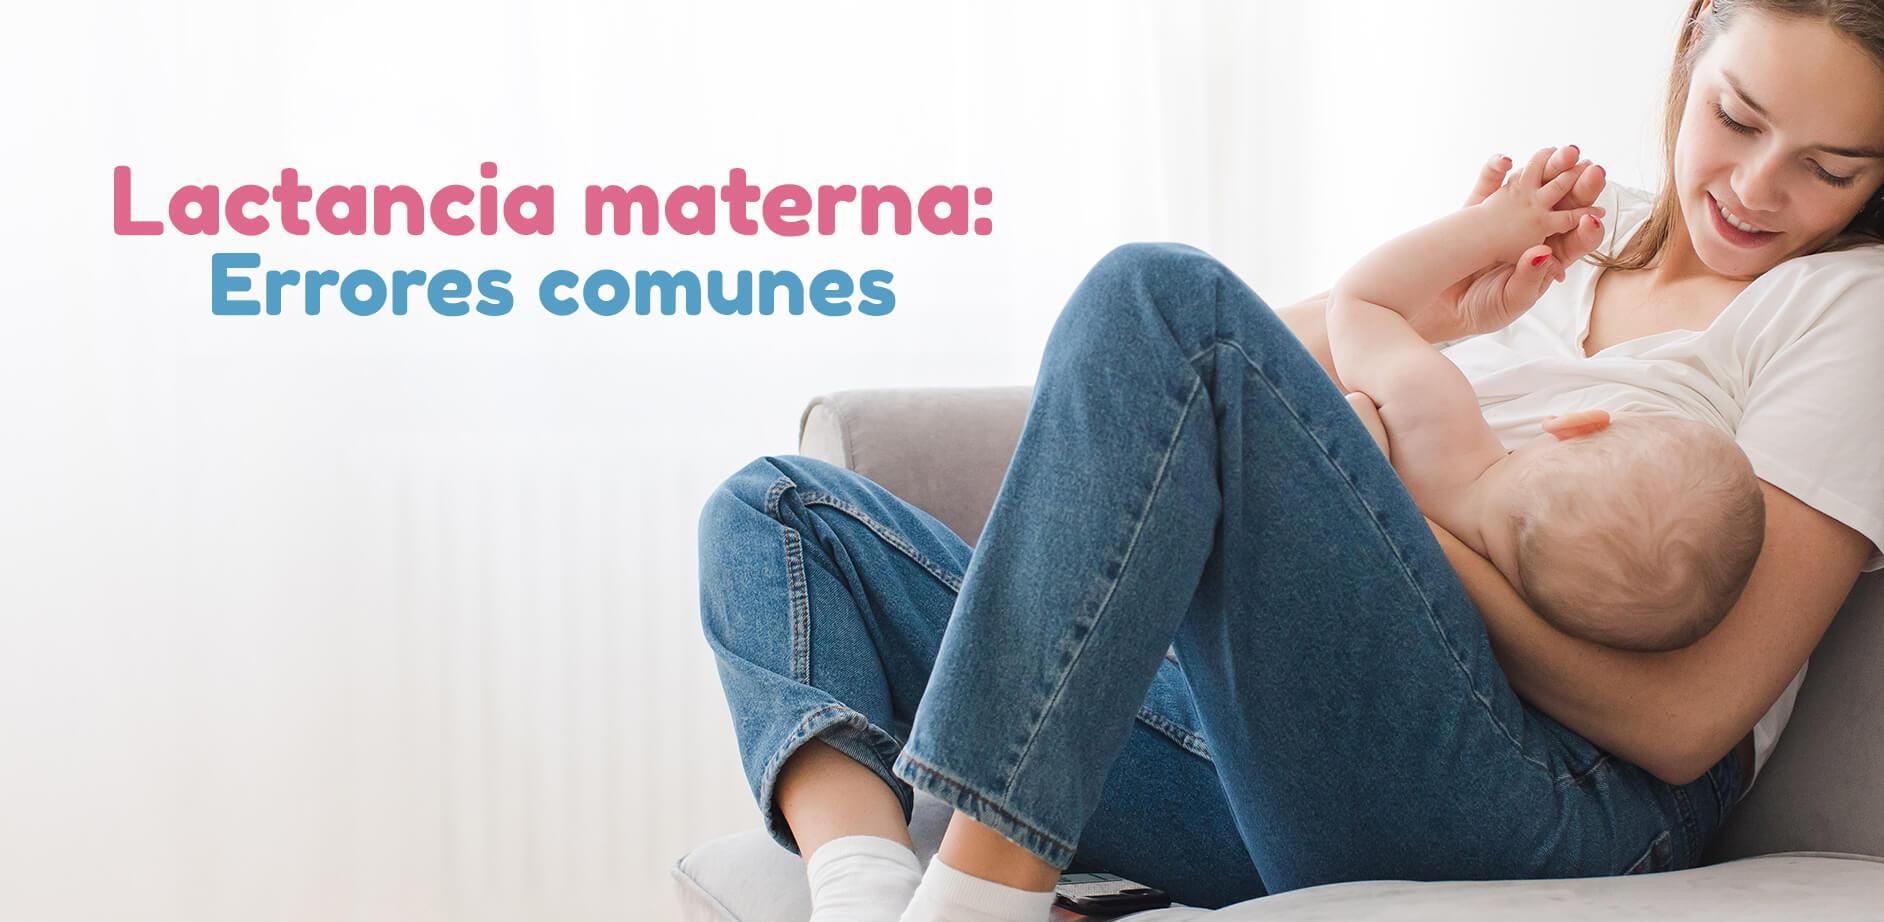 Lactancia materna: Errores comunes